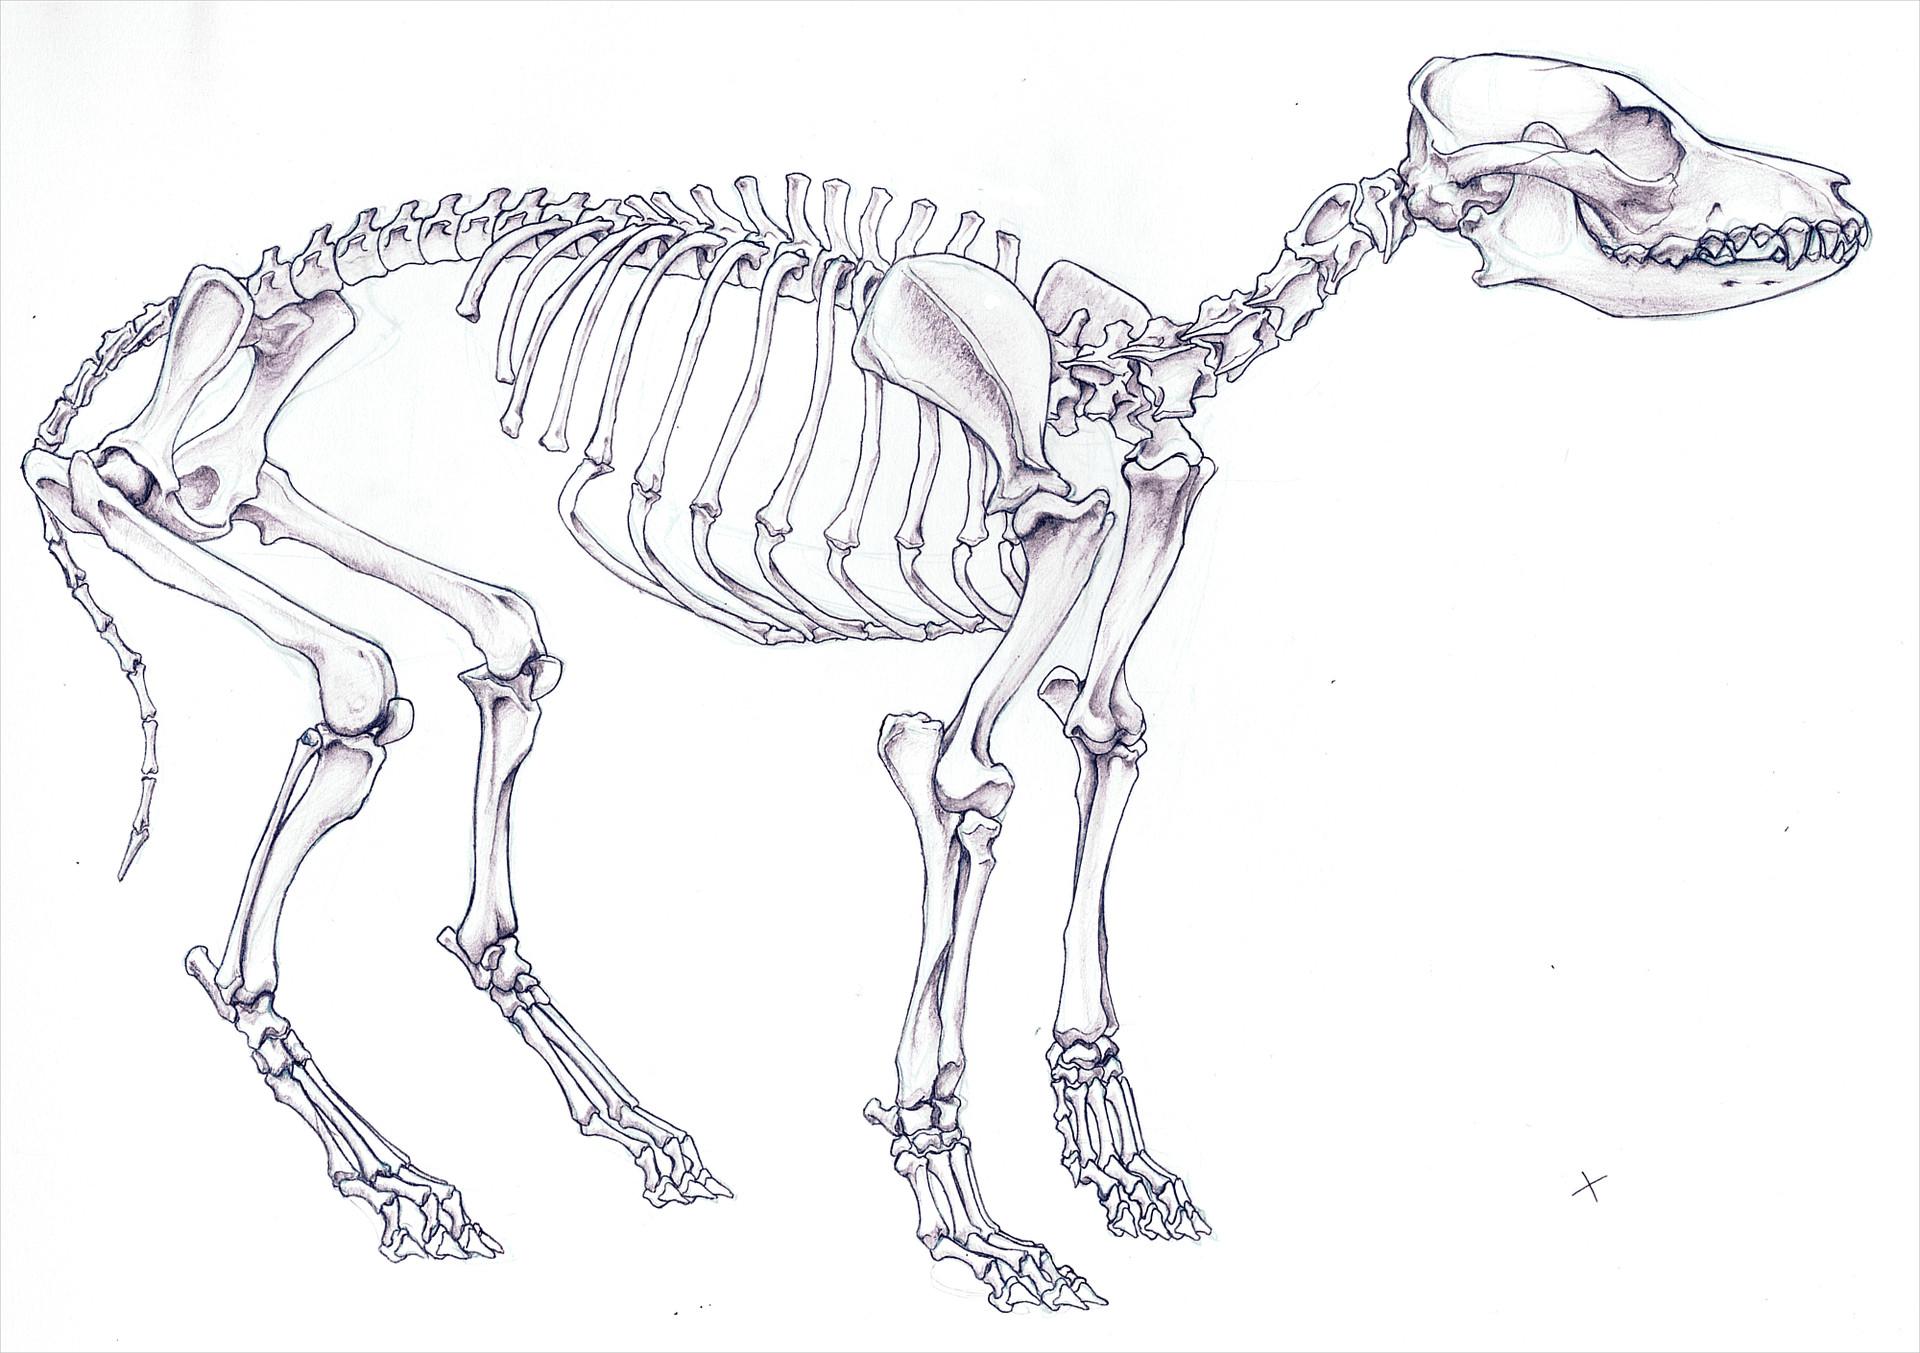 Chris Guo - Anatomy study - Dog